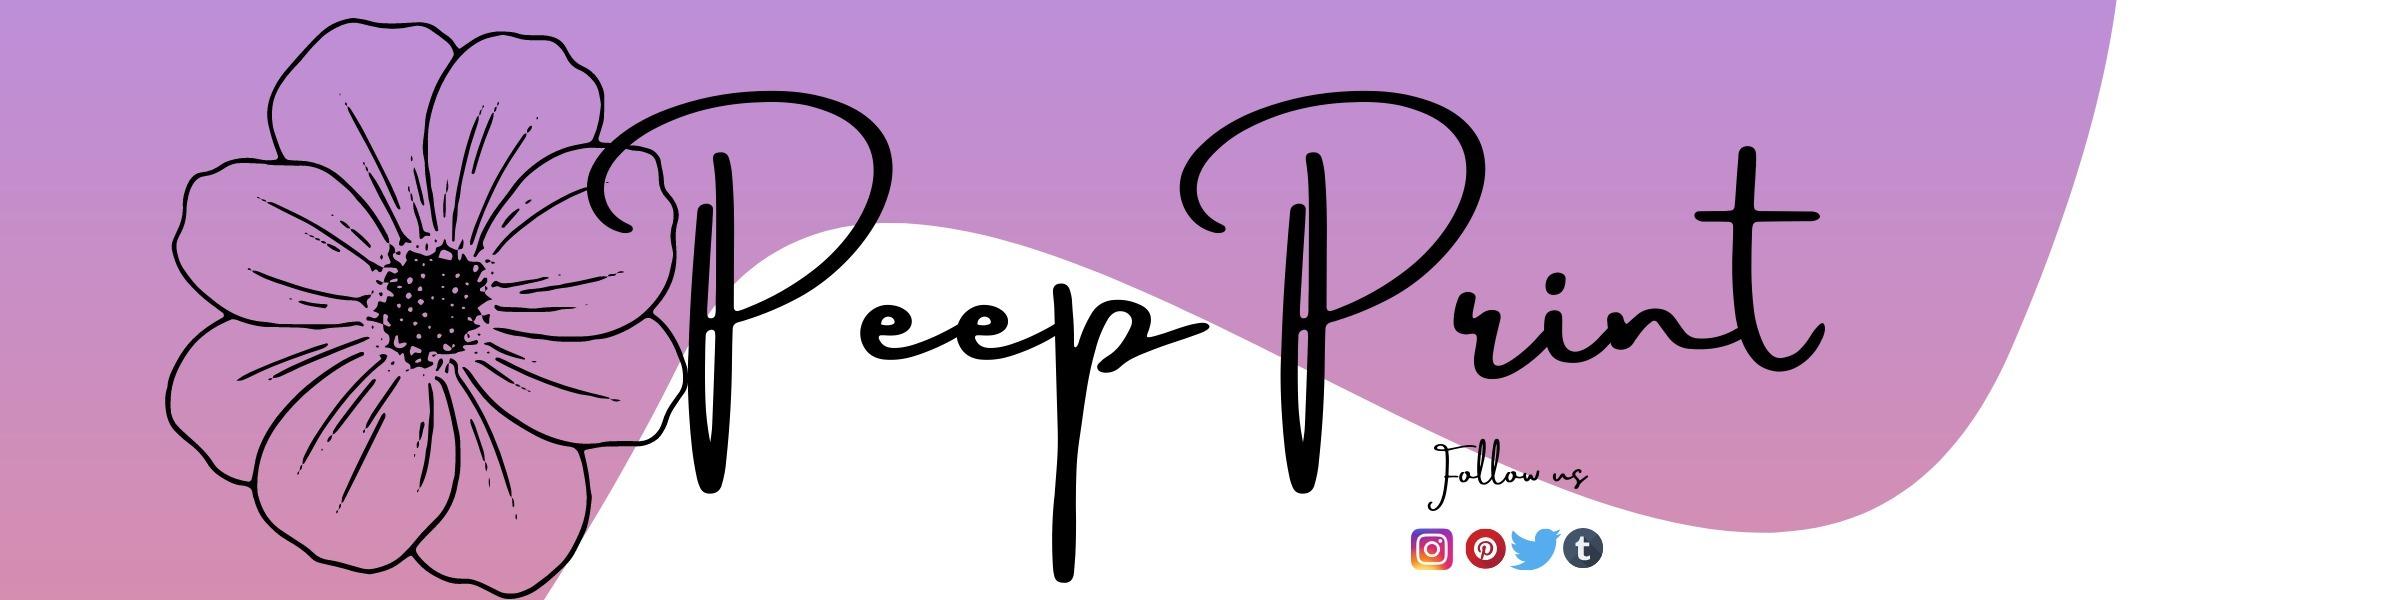 @peepprint Cover Image